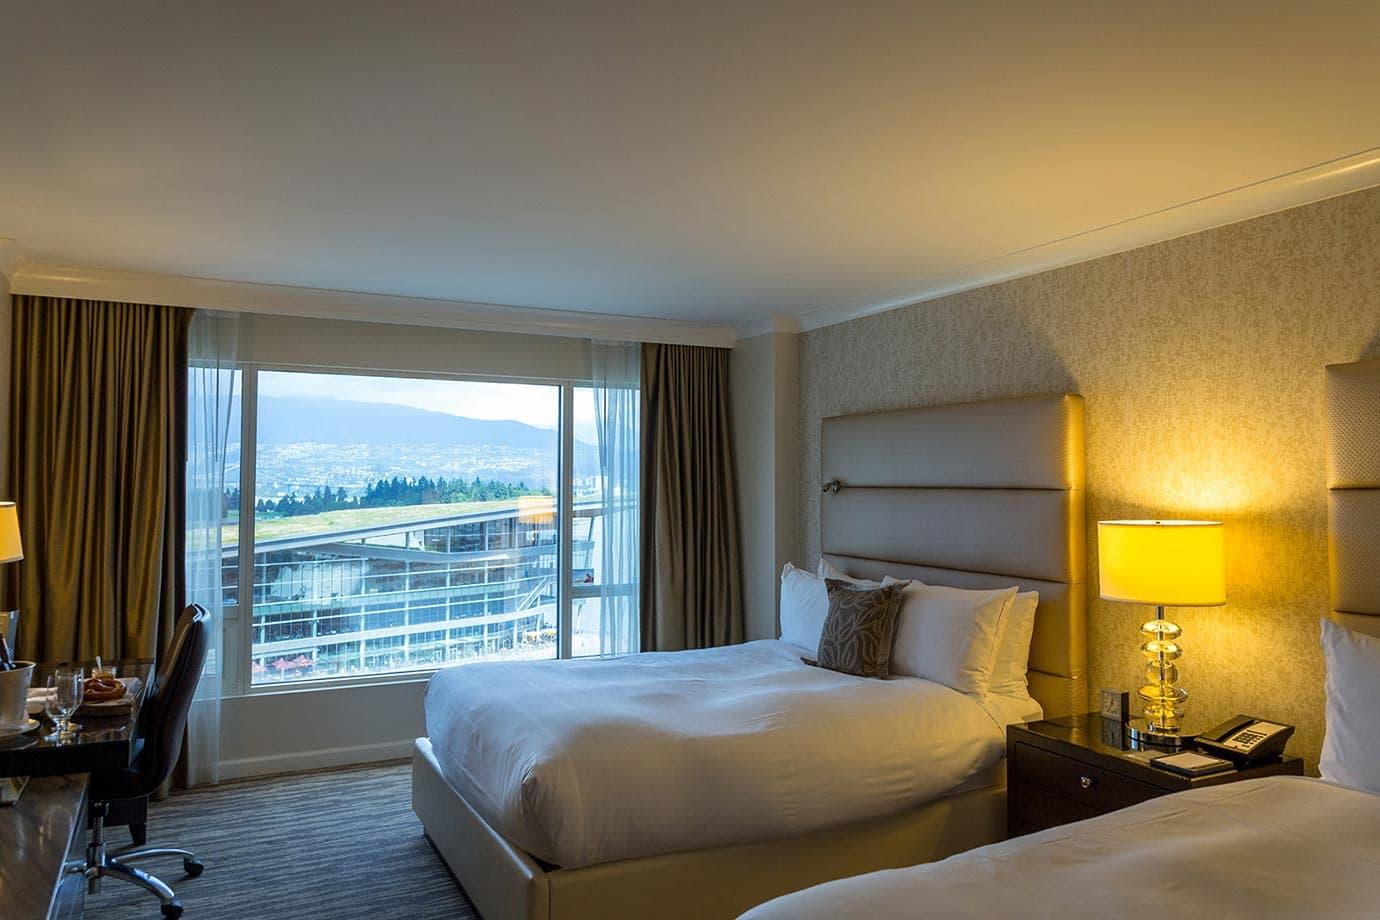 Fairmont Waterfront rooms